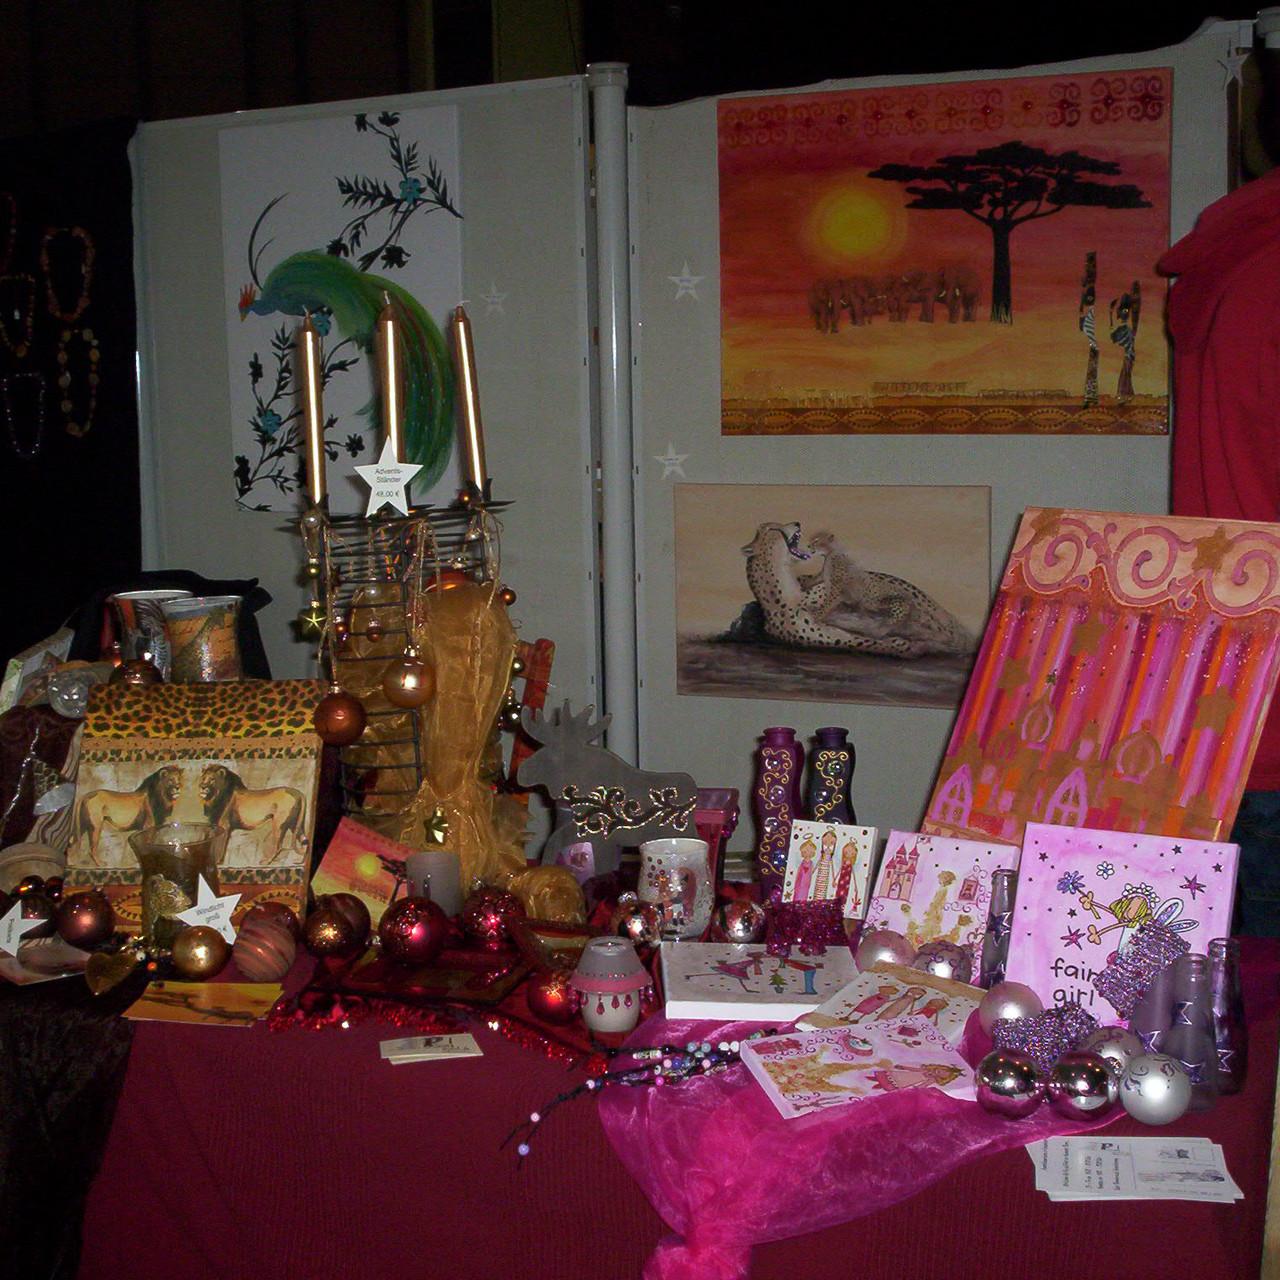 2009 Kunst & Hobby Ausstellung, Linkenheim